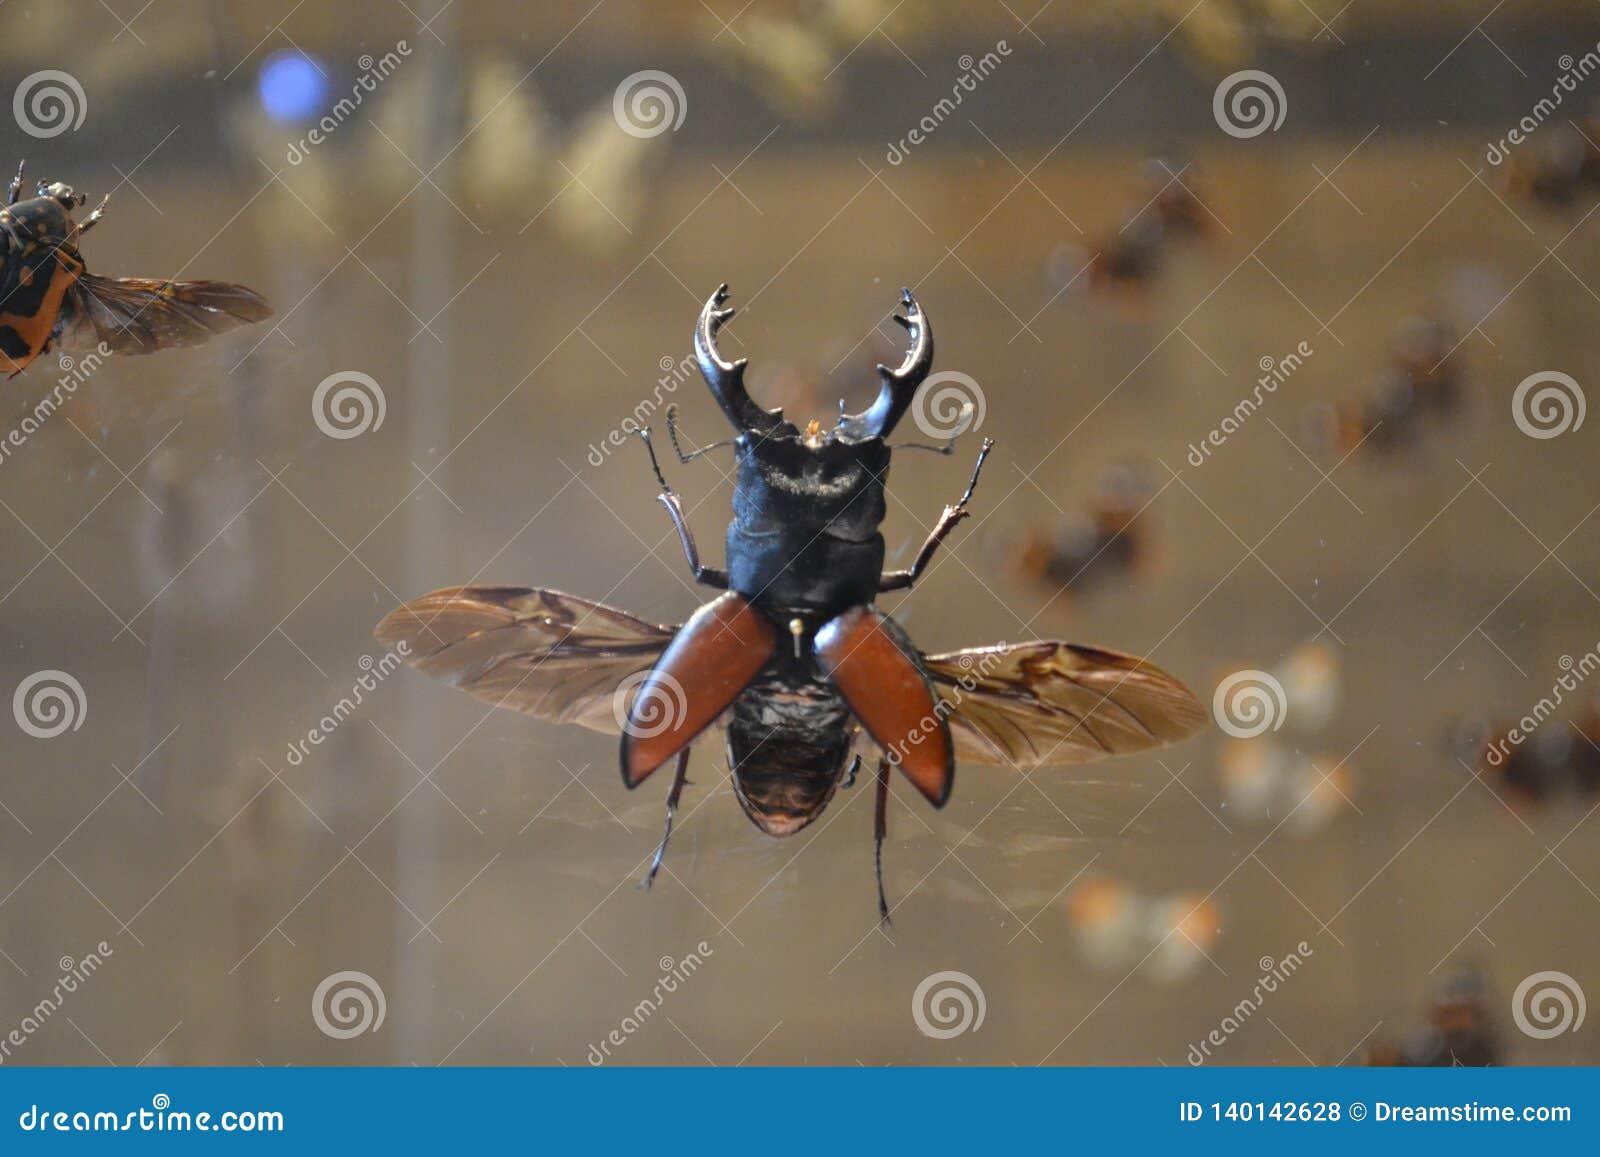 Jeleń ścigi duży insekt w muzeum